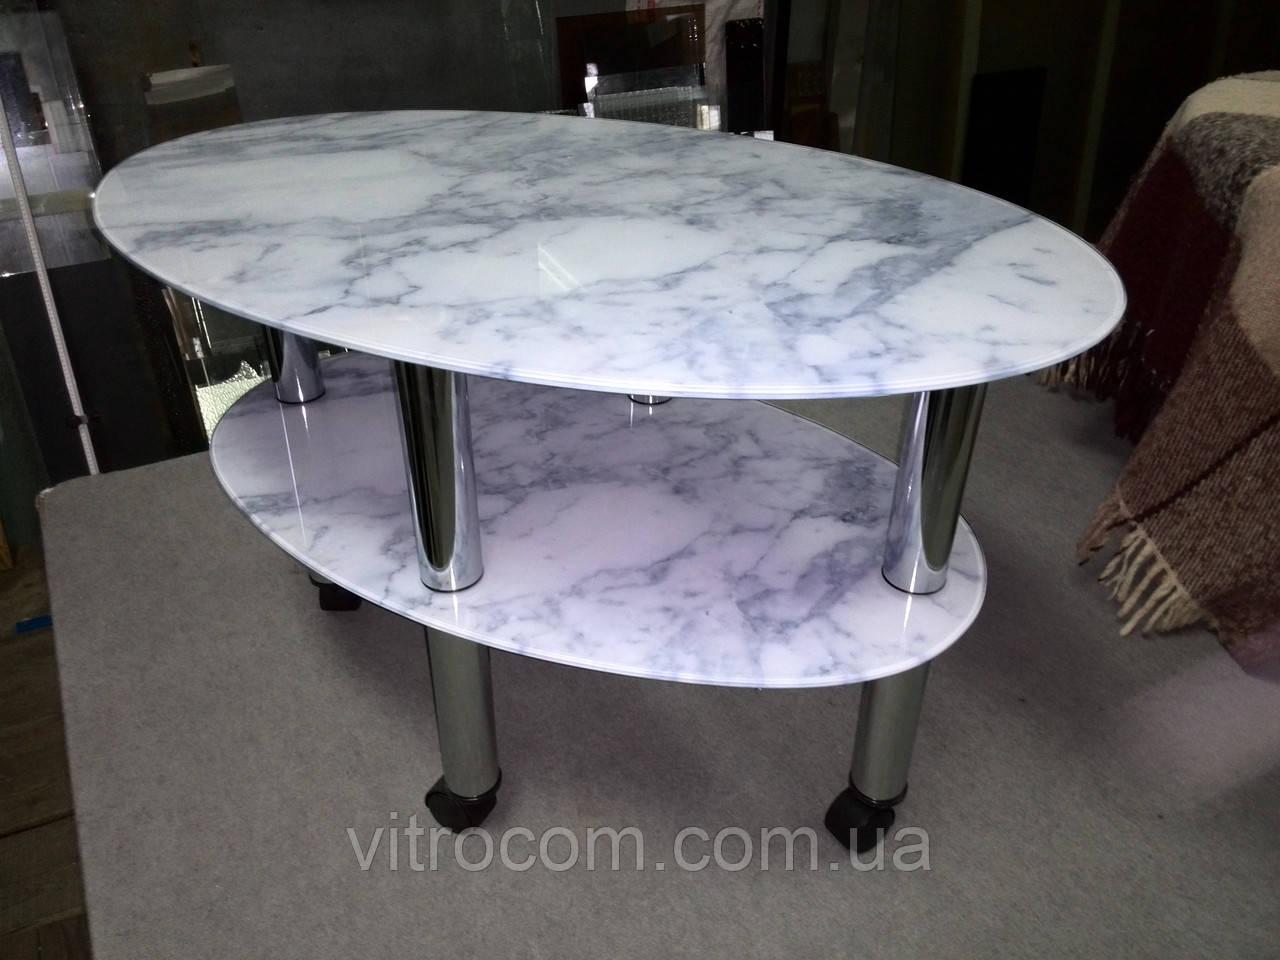 "Журнальный стеклянный столик  Эллипс ""белый мрамор"" 85 х 55 х 56 см"